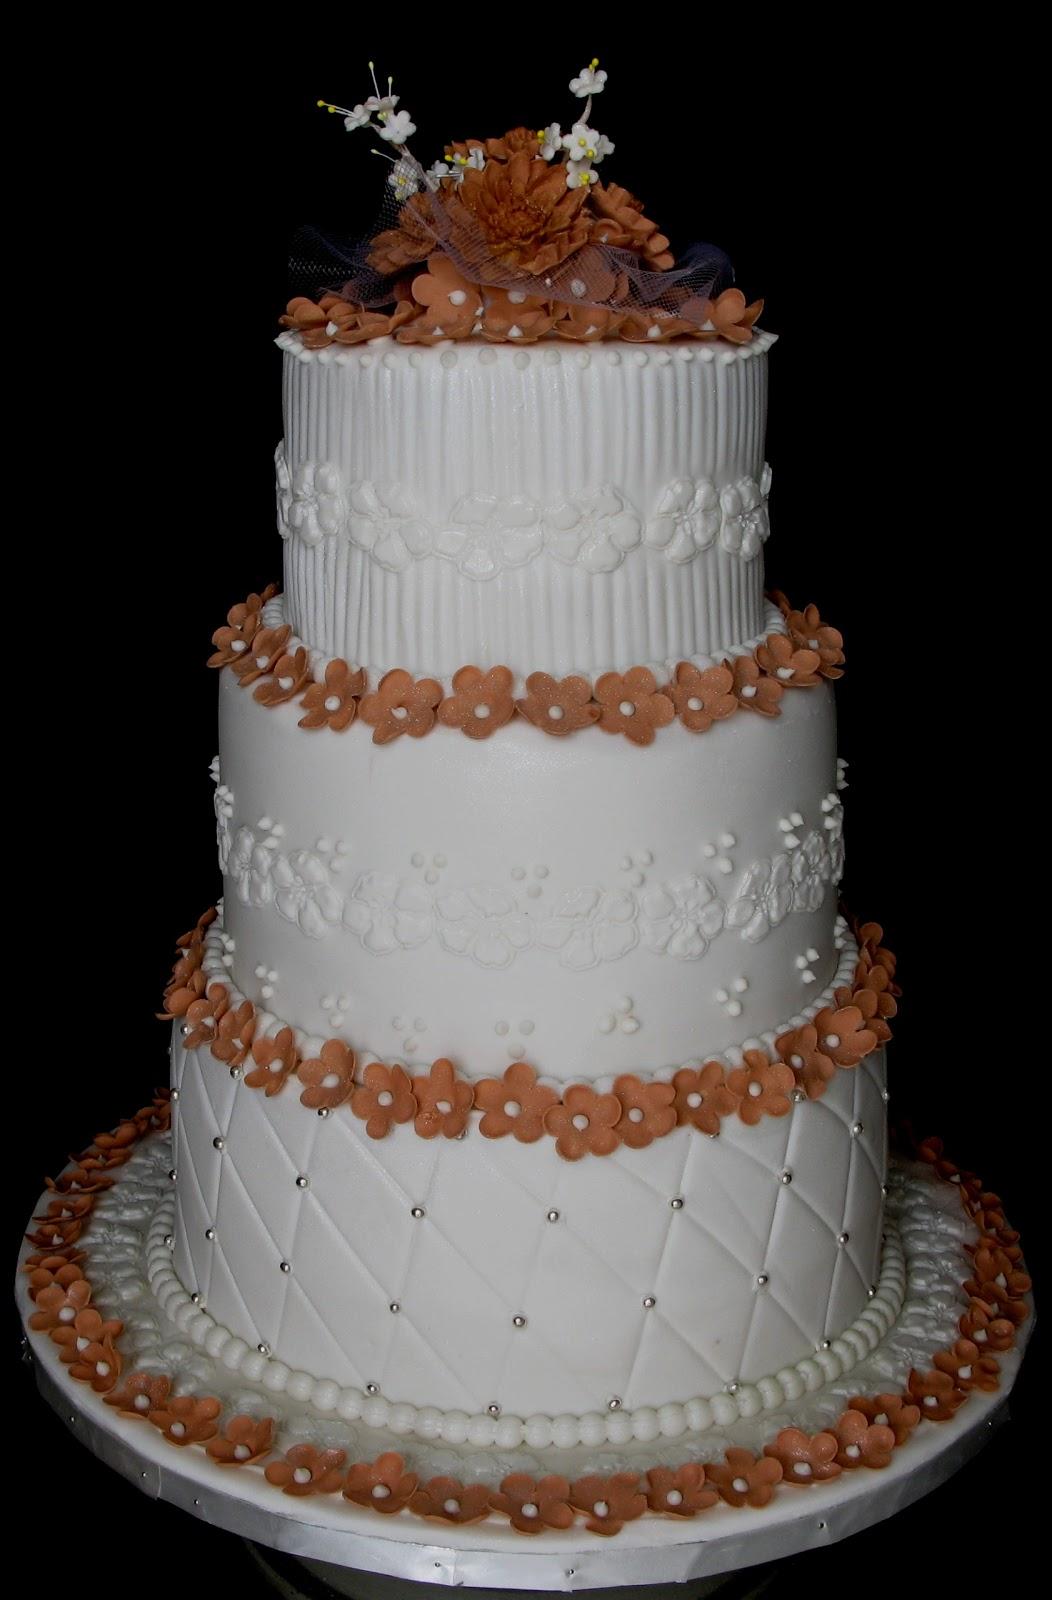 Profile Of Cake Layers